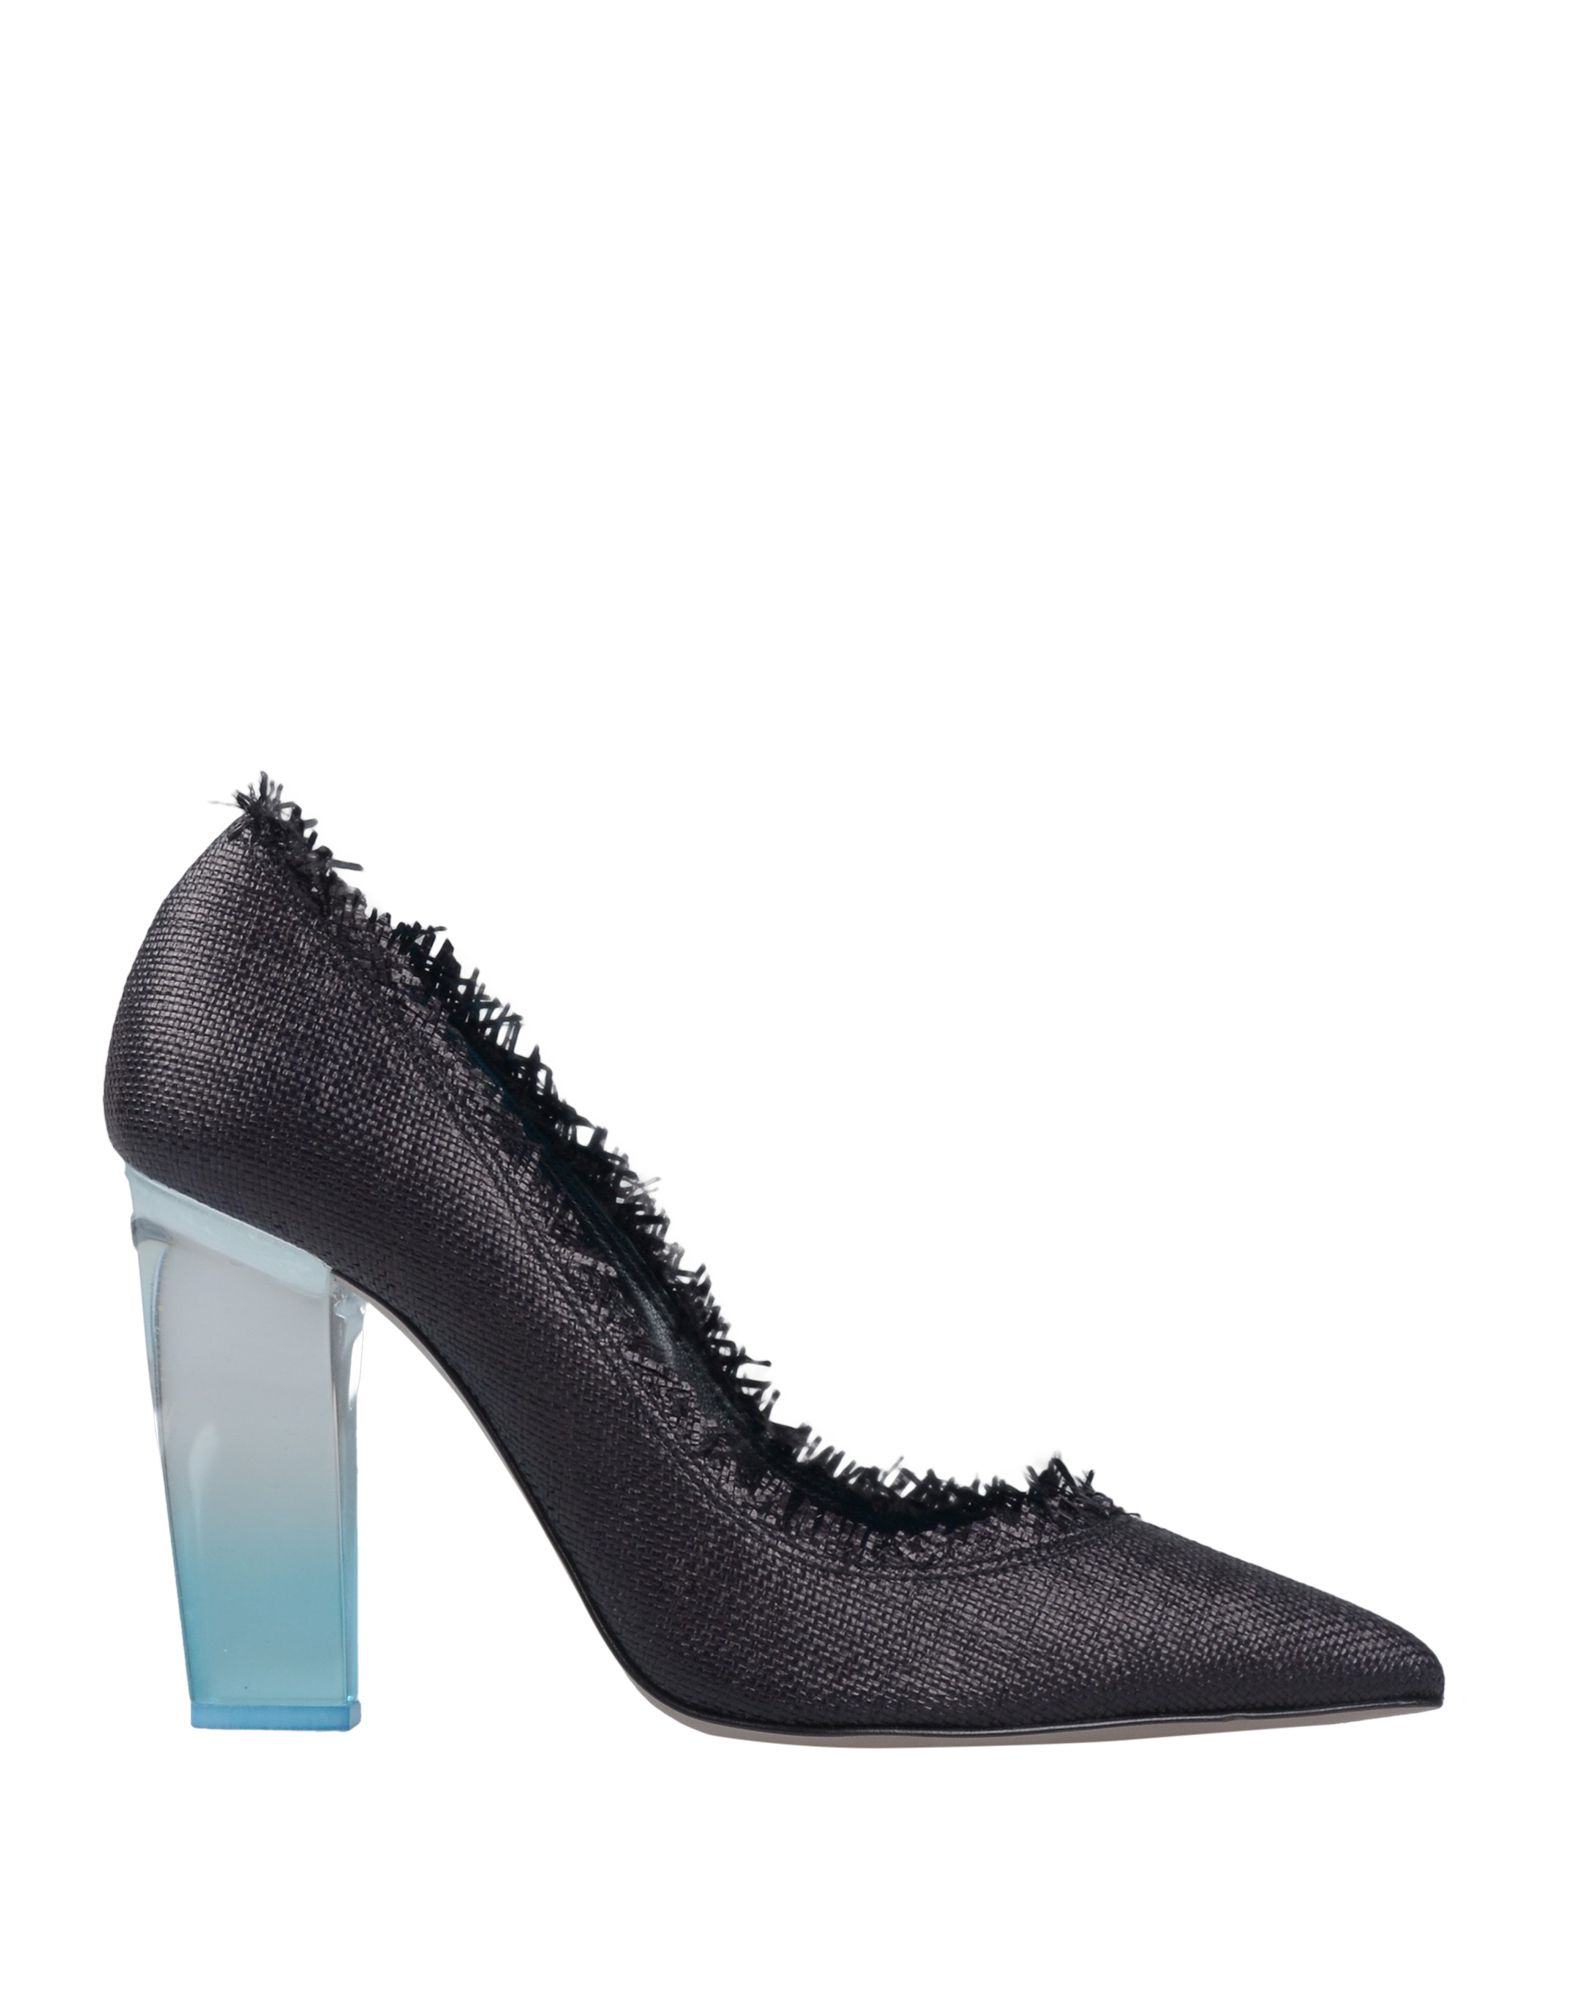 Negro Zapato De De De Salón Magrit Mujer - Salones Magrit Casual salvaje f219e9